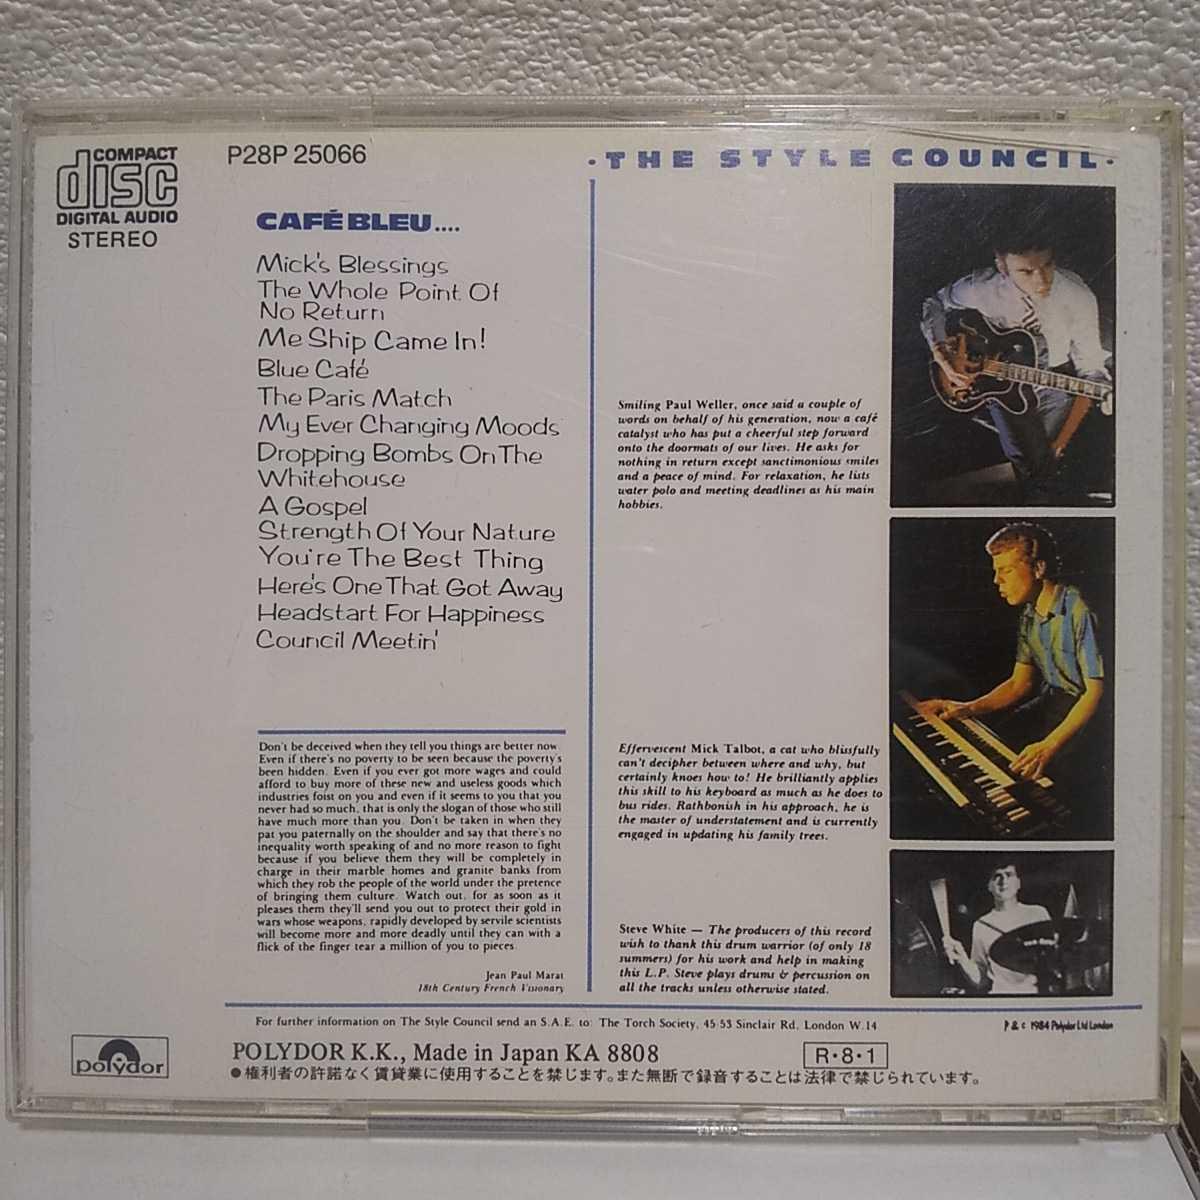 THE STYLE COUNCIL/CAFE BLEU(国内盤CD)スタイルカウンシル PAUL WELLER ポールウェラー